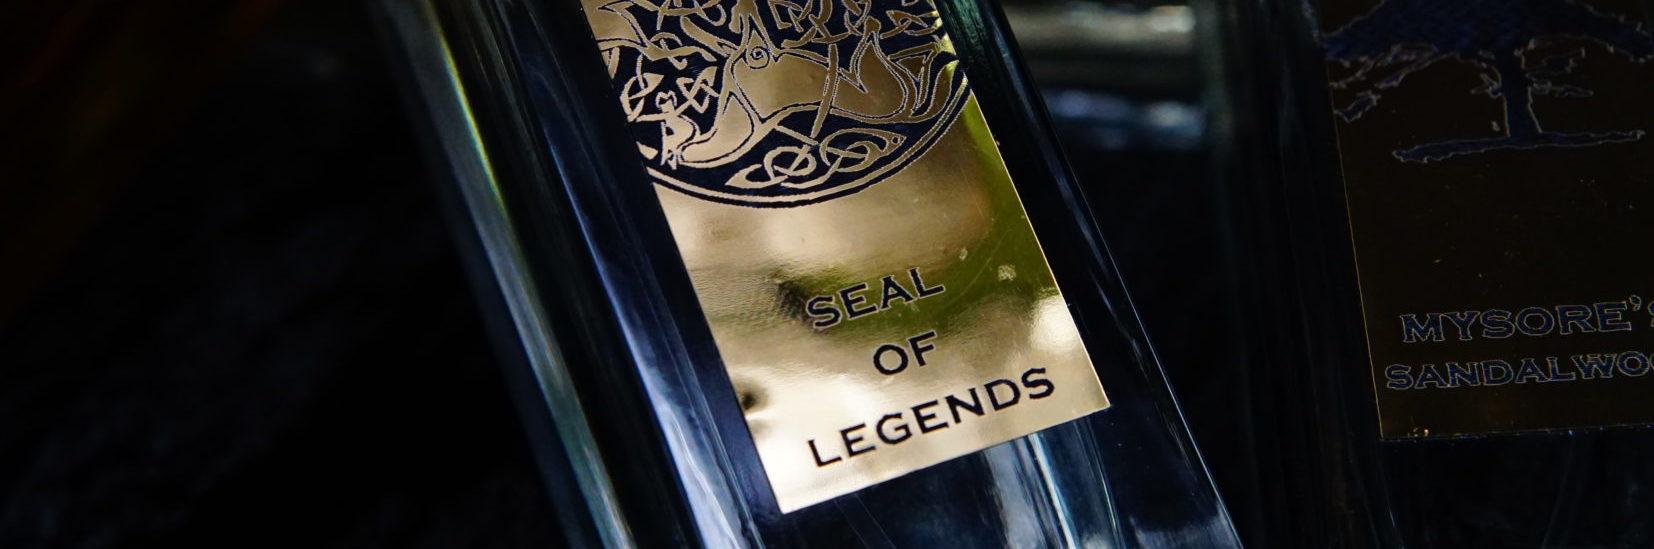 Almah Seal Of Legends